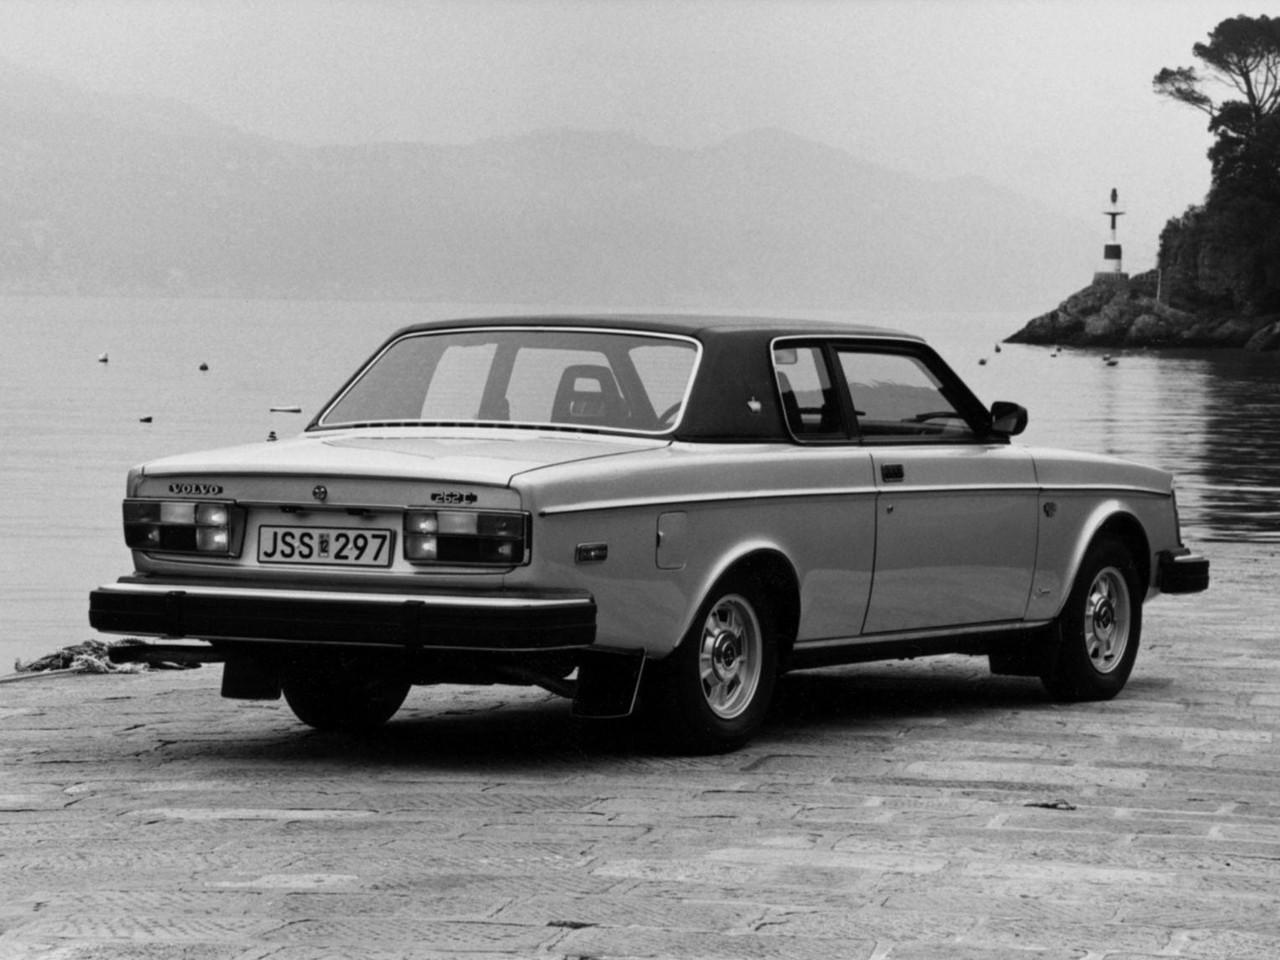 VOLVO 262 C - 1977, 1978, 1979, 1980, 1981 - autoevolution